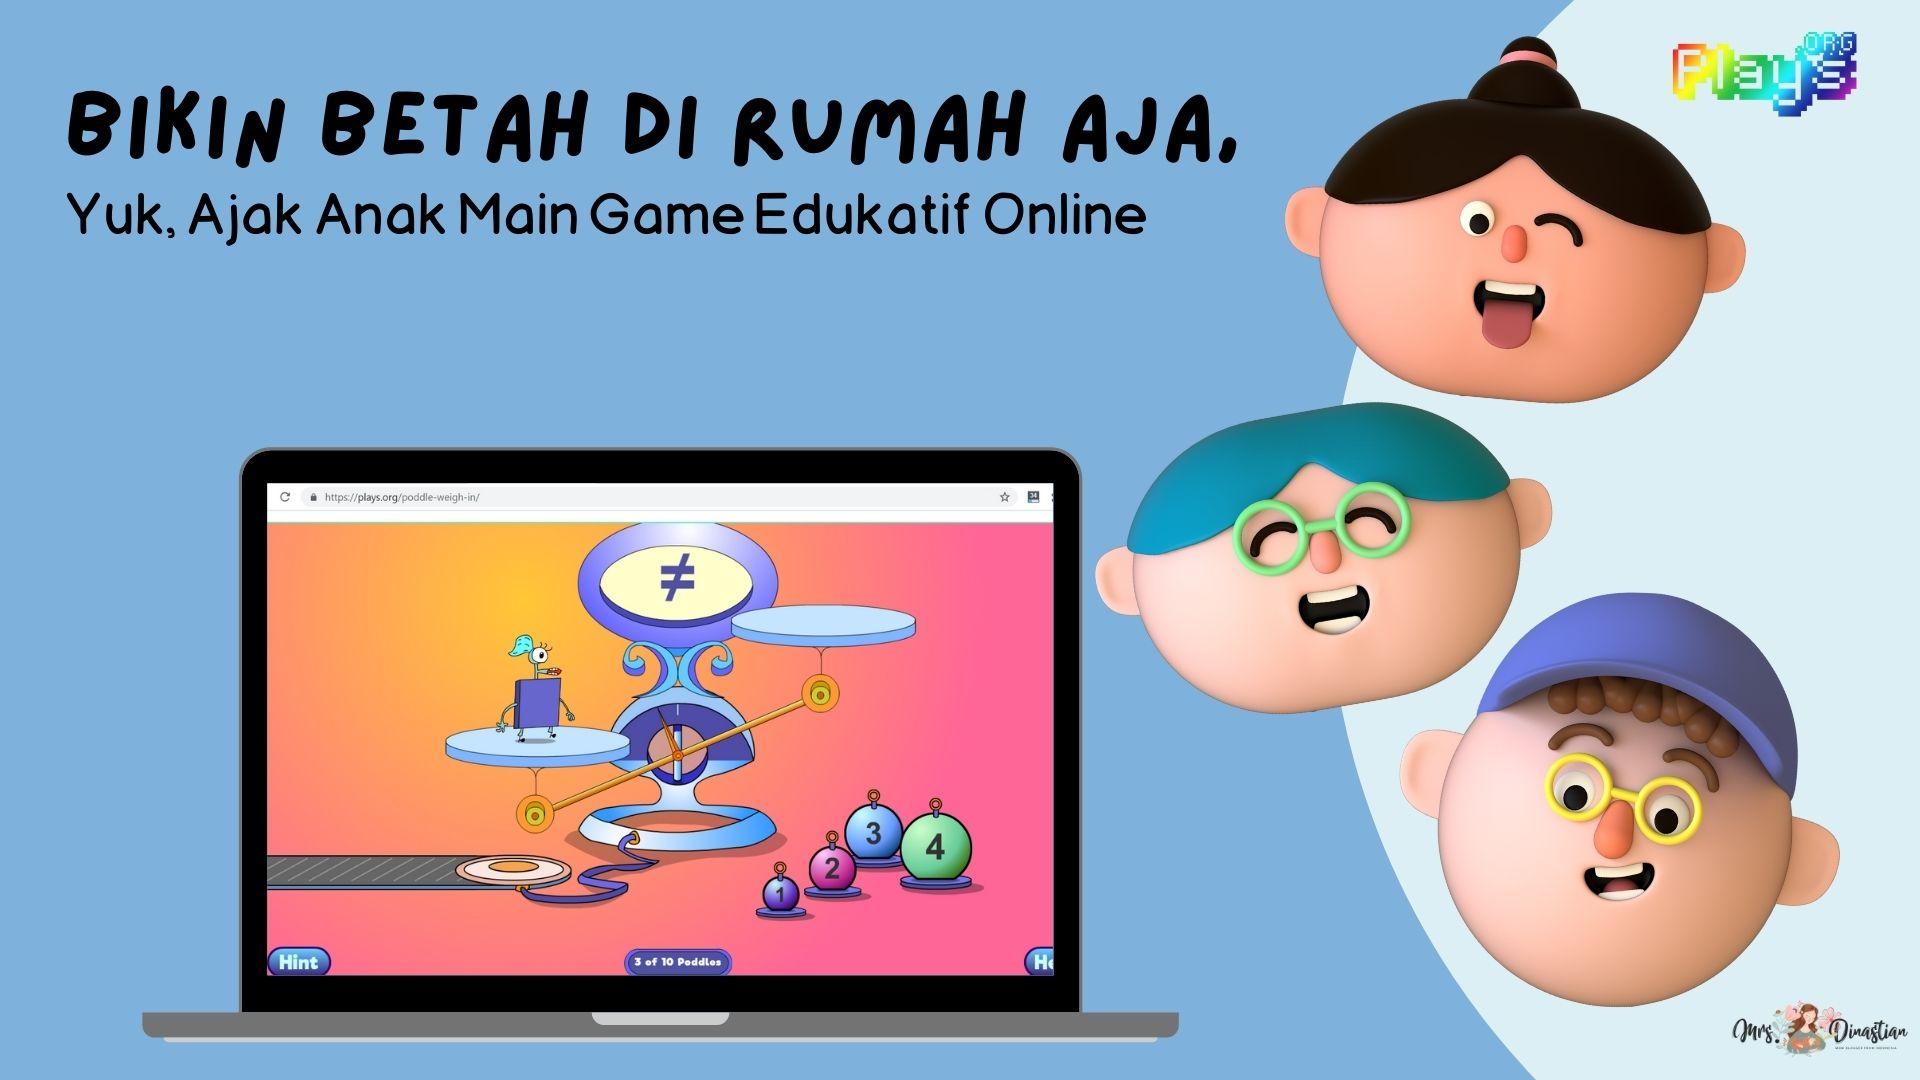 Game Edukatif Online Plays.org